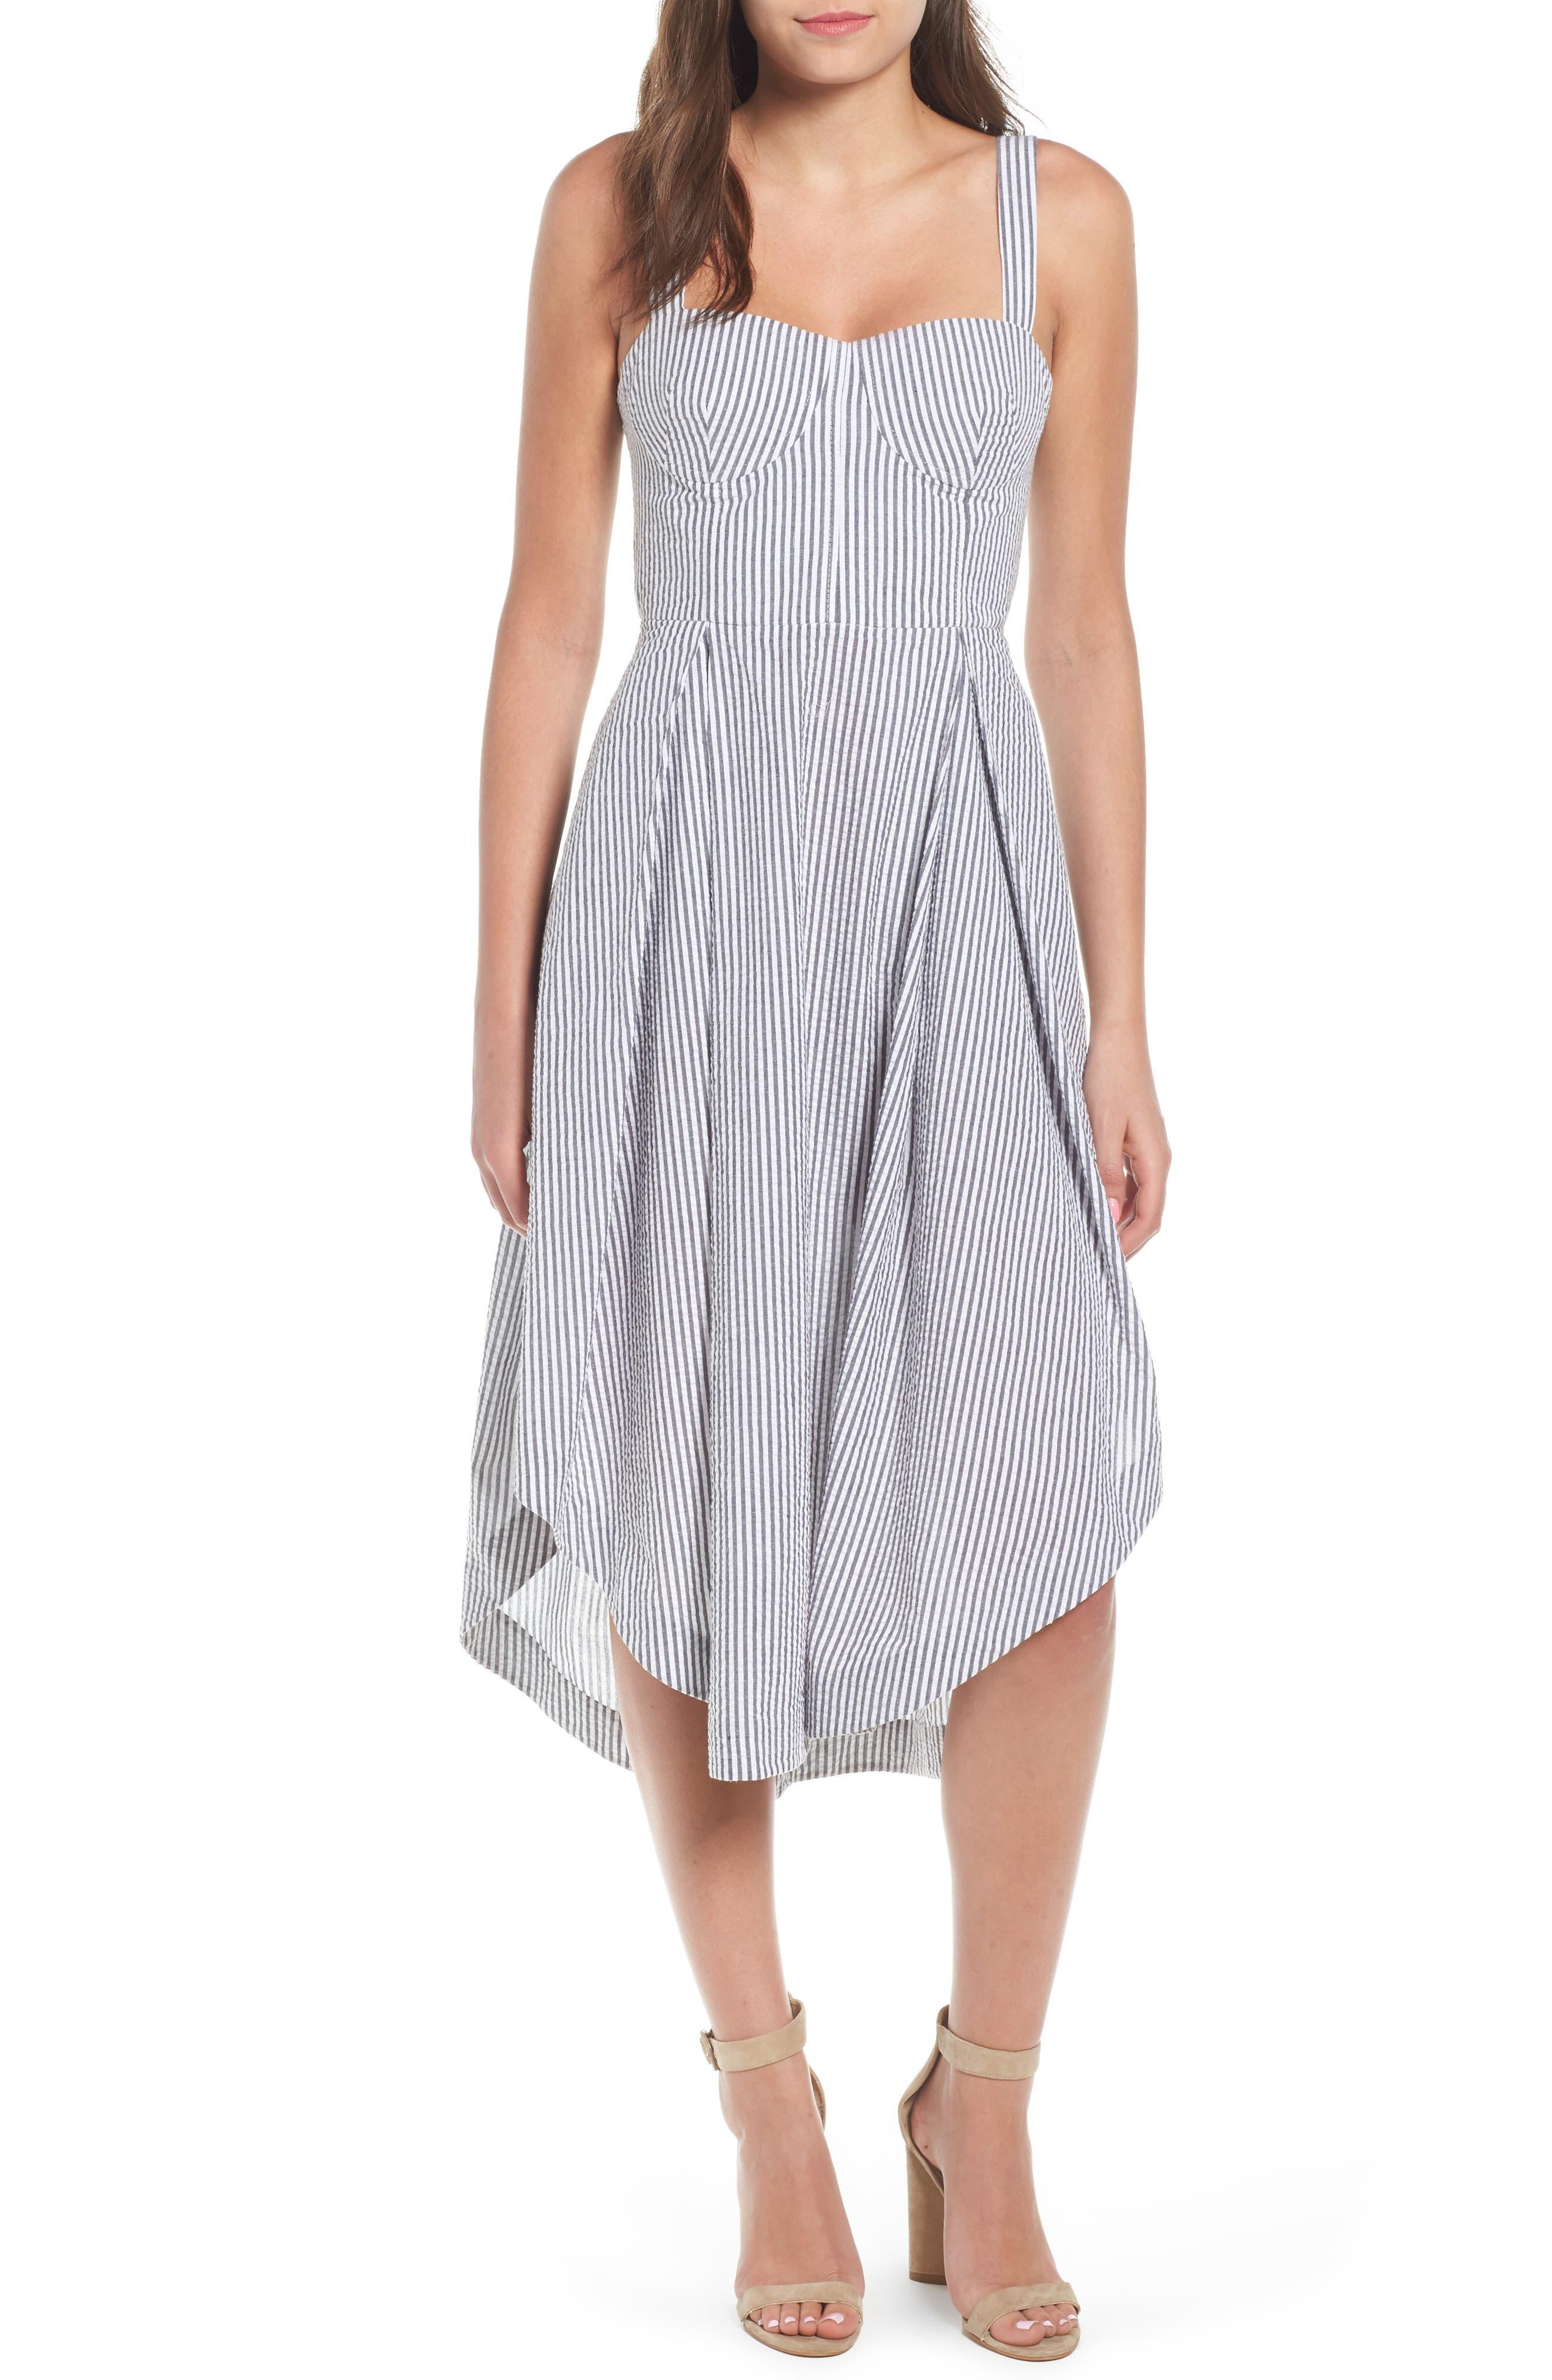 Seersucker Bustier Midi Dress,                             Main thumbnail 1, color,                             Black/ White Multi